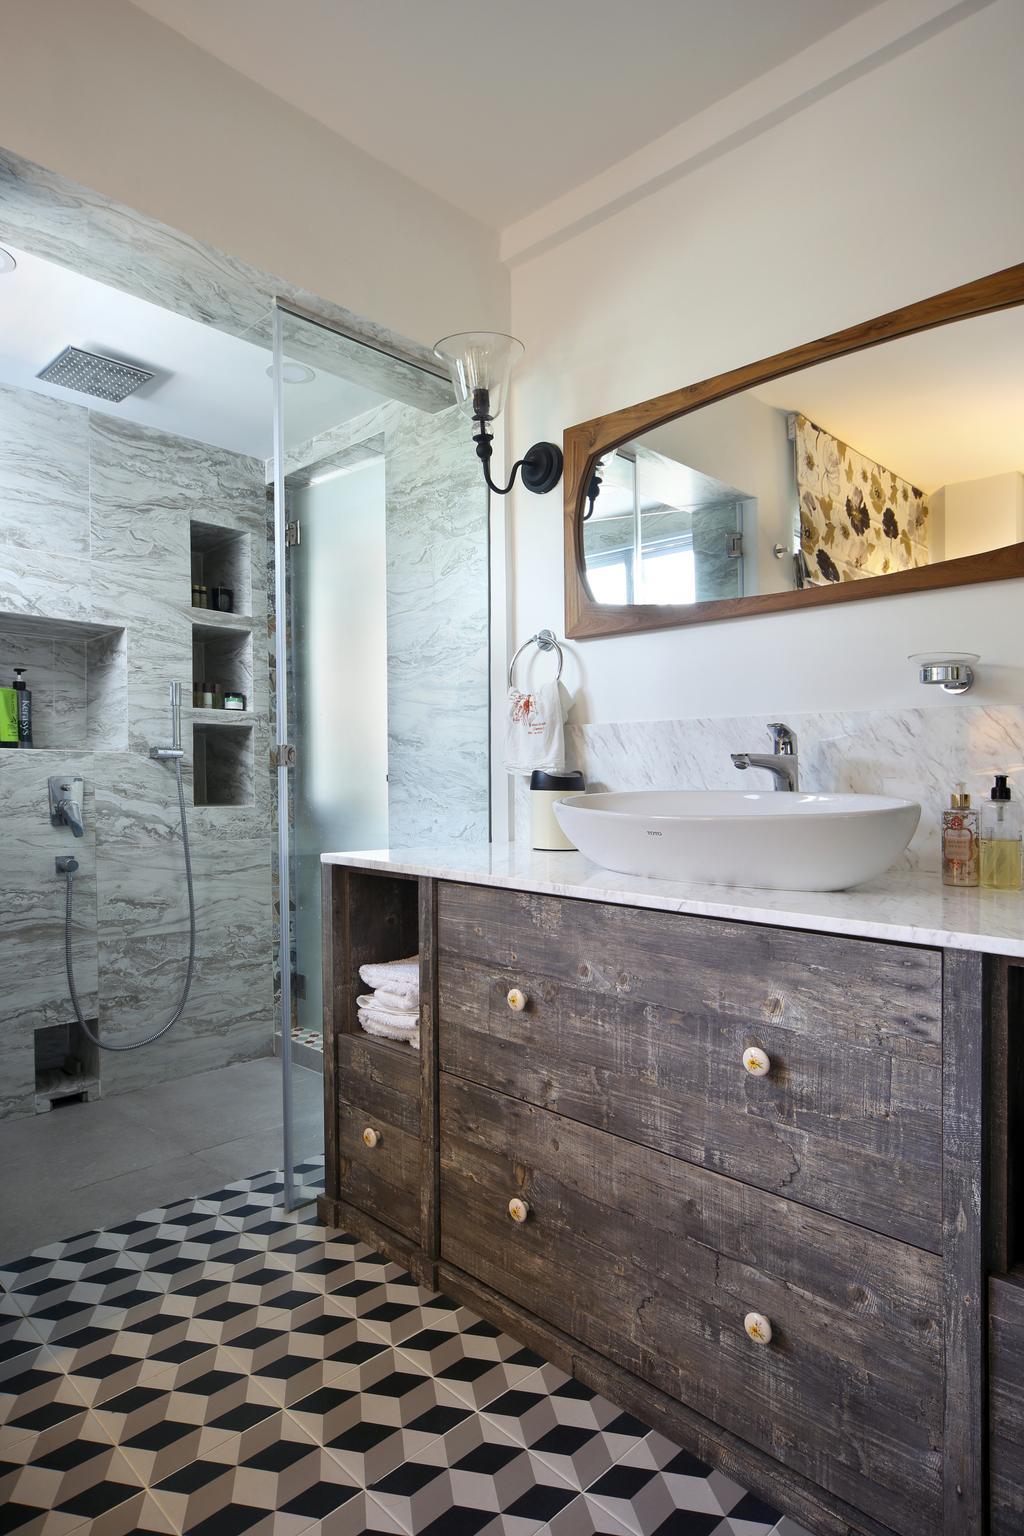 Eclectic, HDB, Bathroom, Marine Drive (Block 75), Interior Designer, The Scientist, White Bathroom, Bathroom Vanity, Bathroom Cabinet, Vessel Sink, Mirror, Shower Screen, Patterned Tiles, Geometric Tiles, Resort Style, Sink